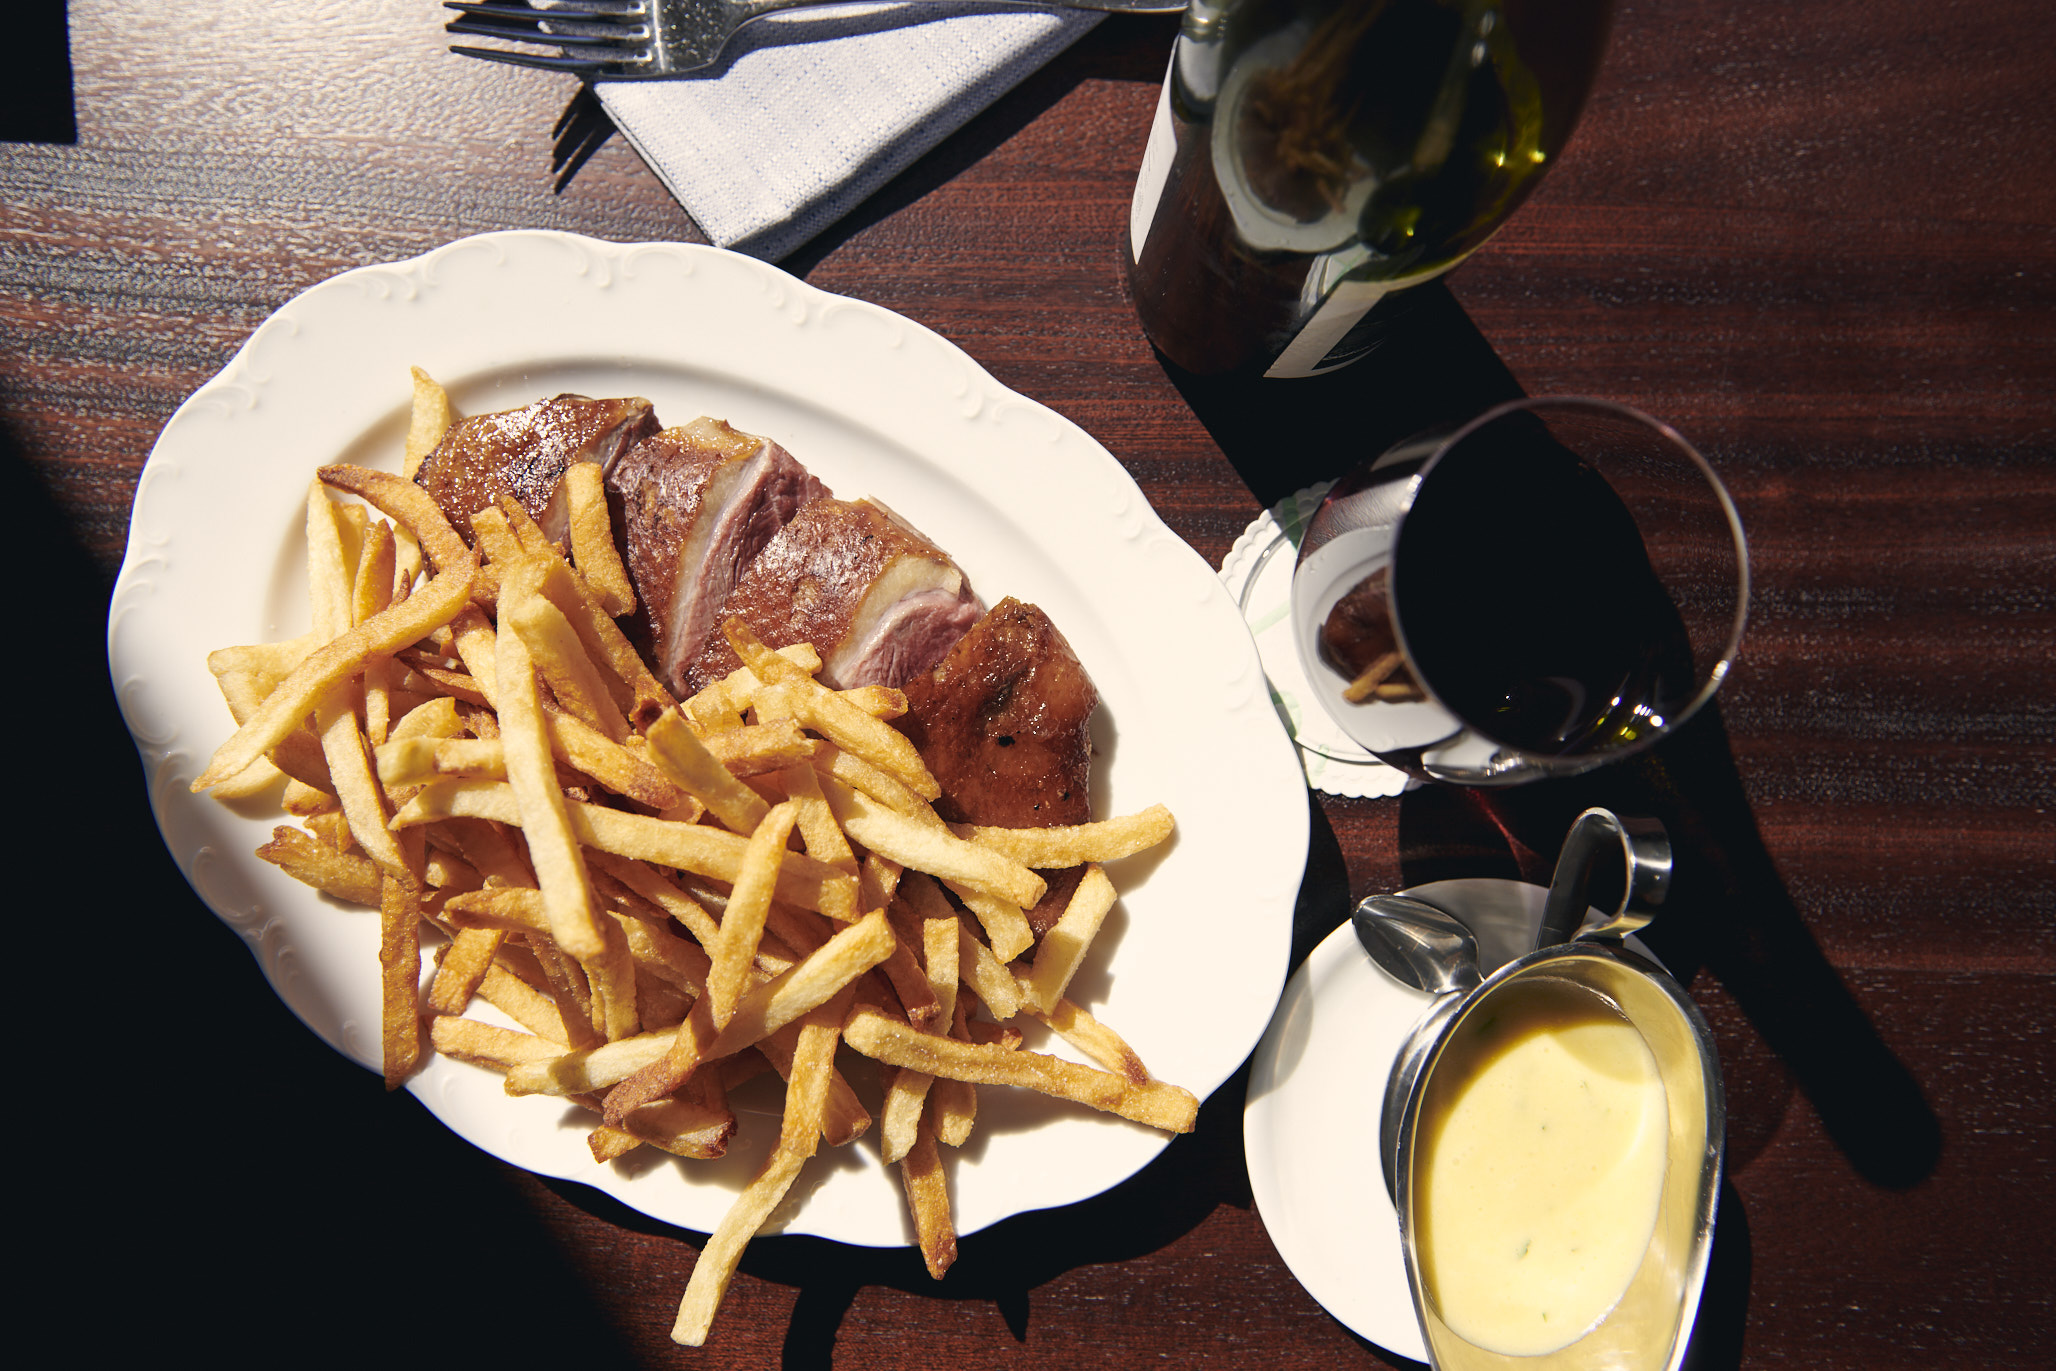 Frenchette duck frites